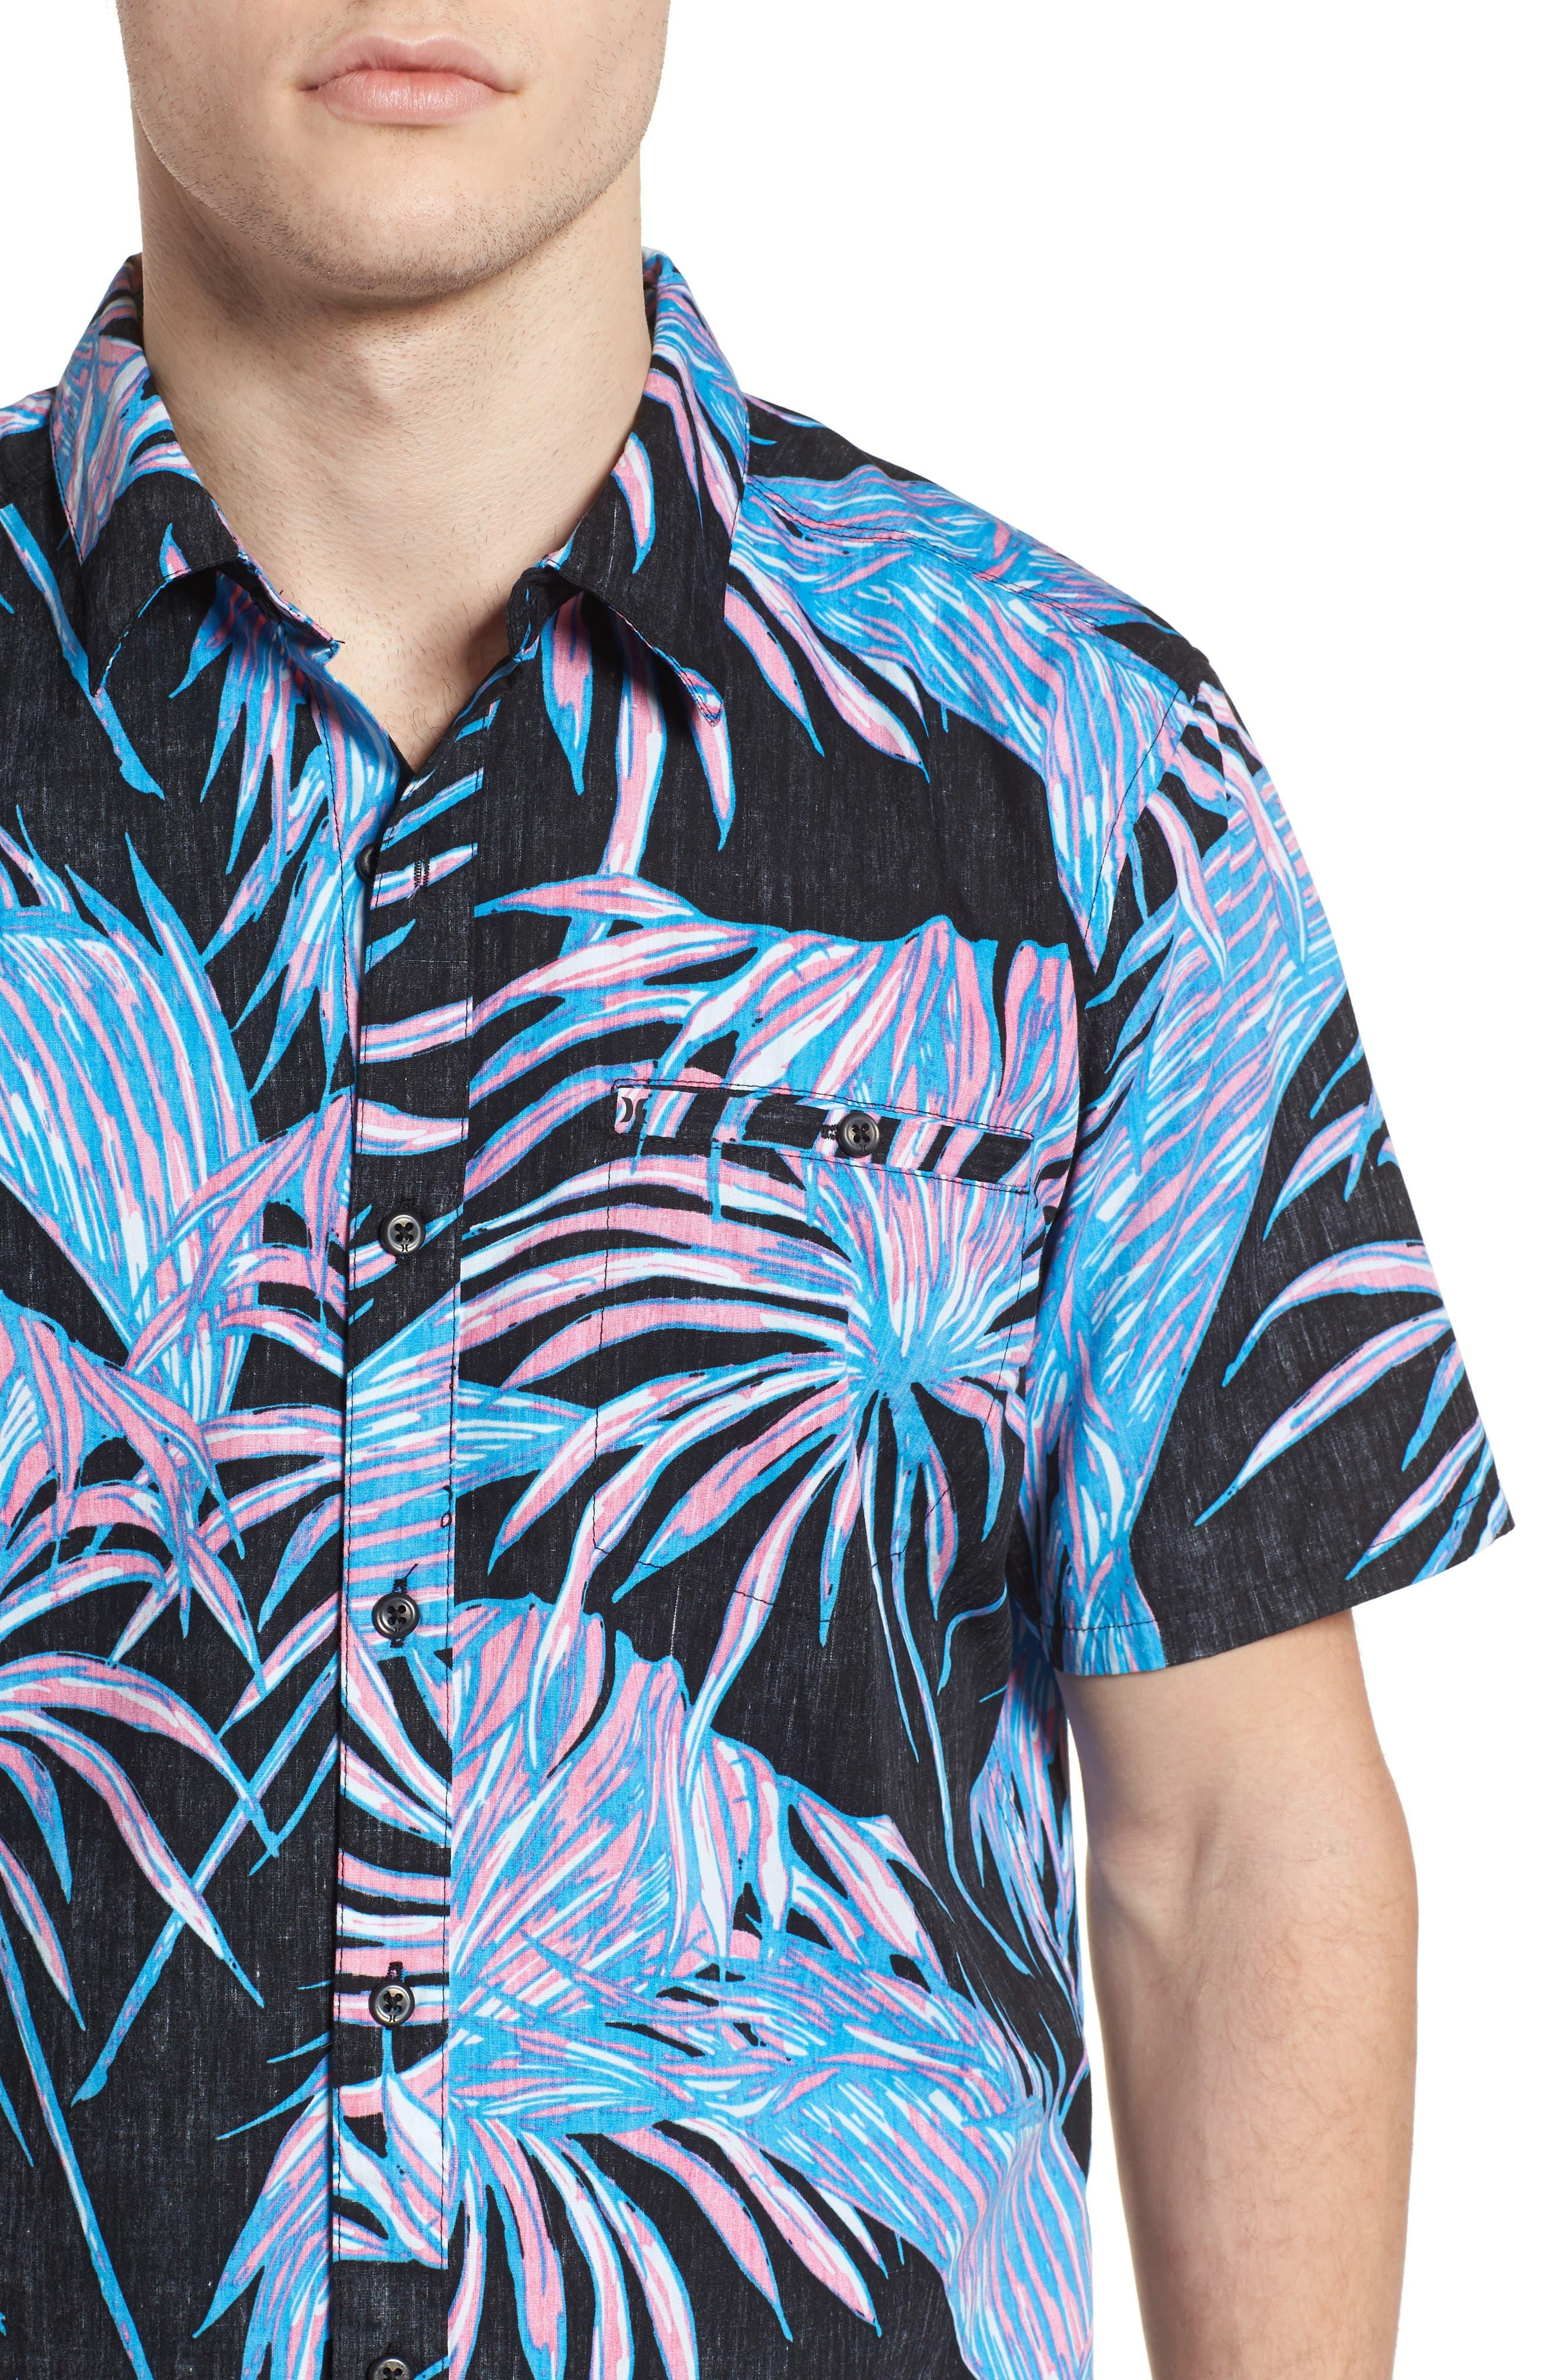 Koko Shirt,                             Alternate thumbnail 4, color,                             010